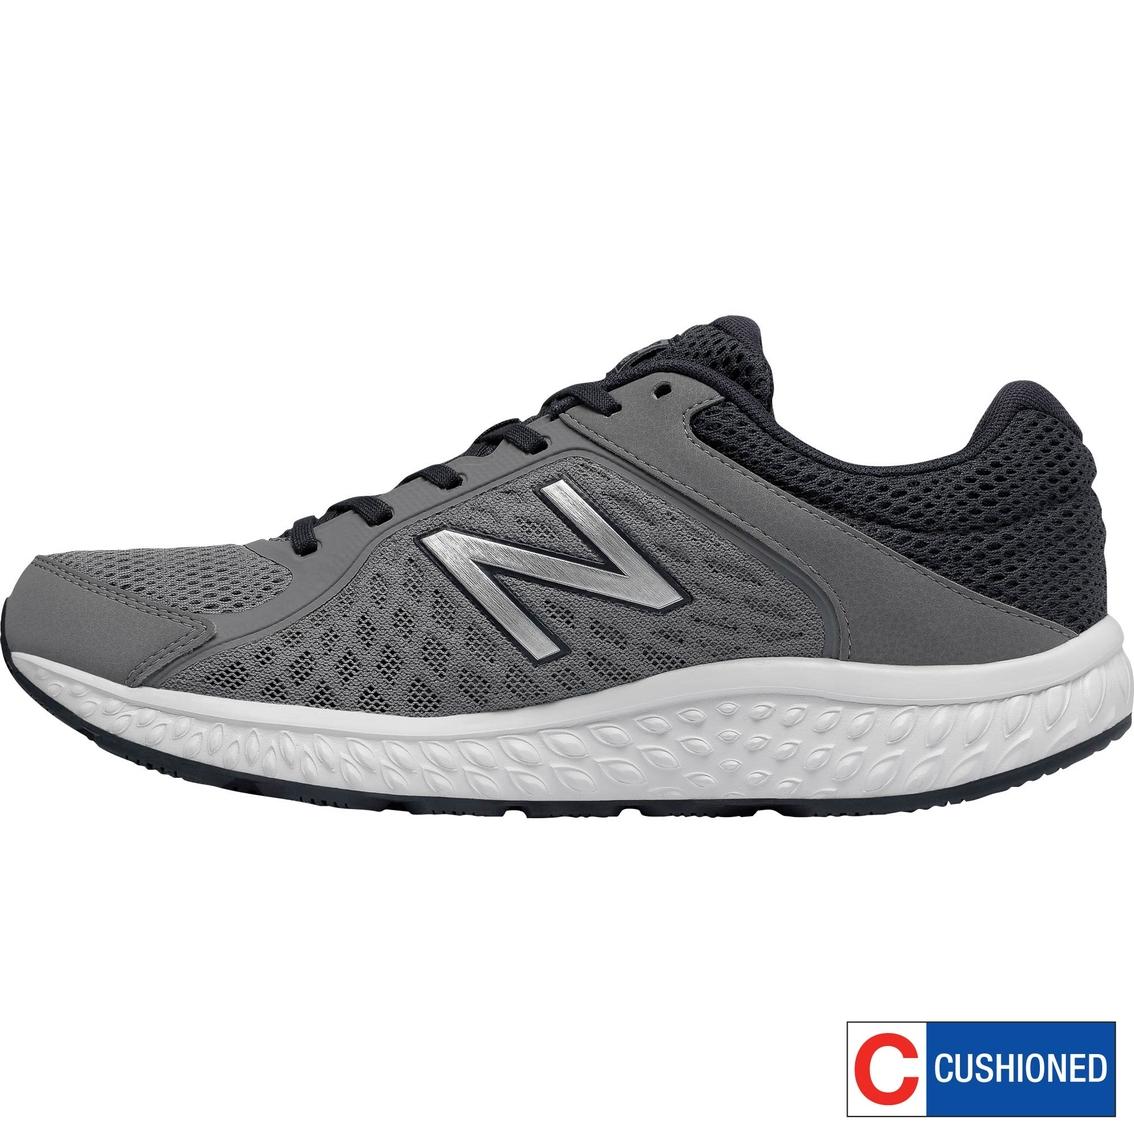 576abe7c251 New Balance Men's M420lg4 Cushioned Running Shoes | Running | Shoes ...